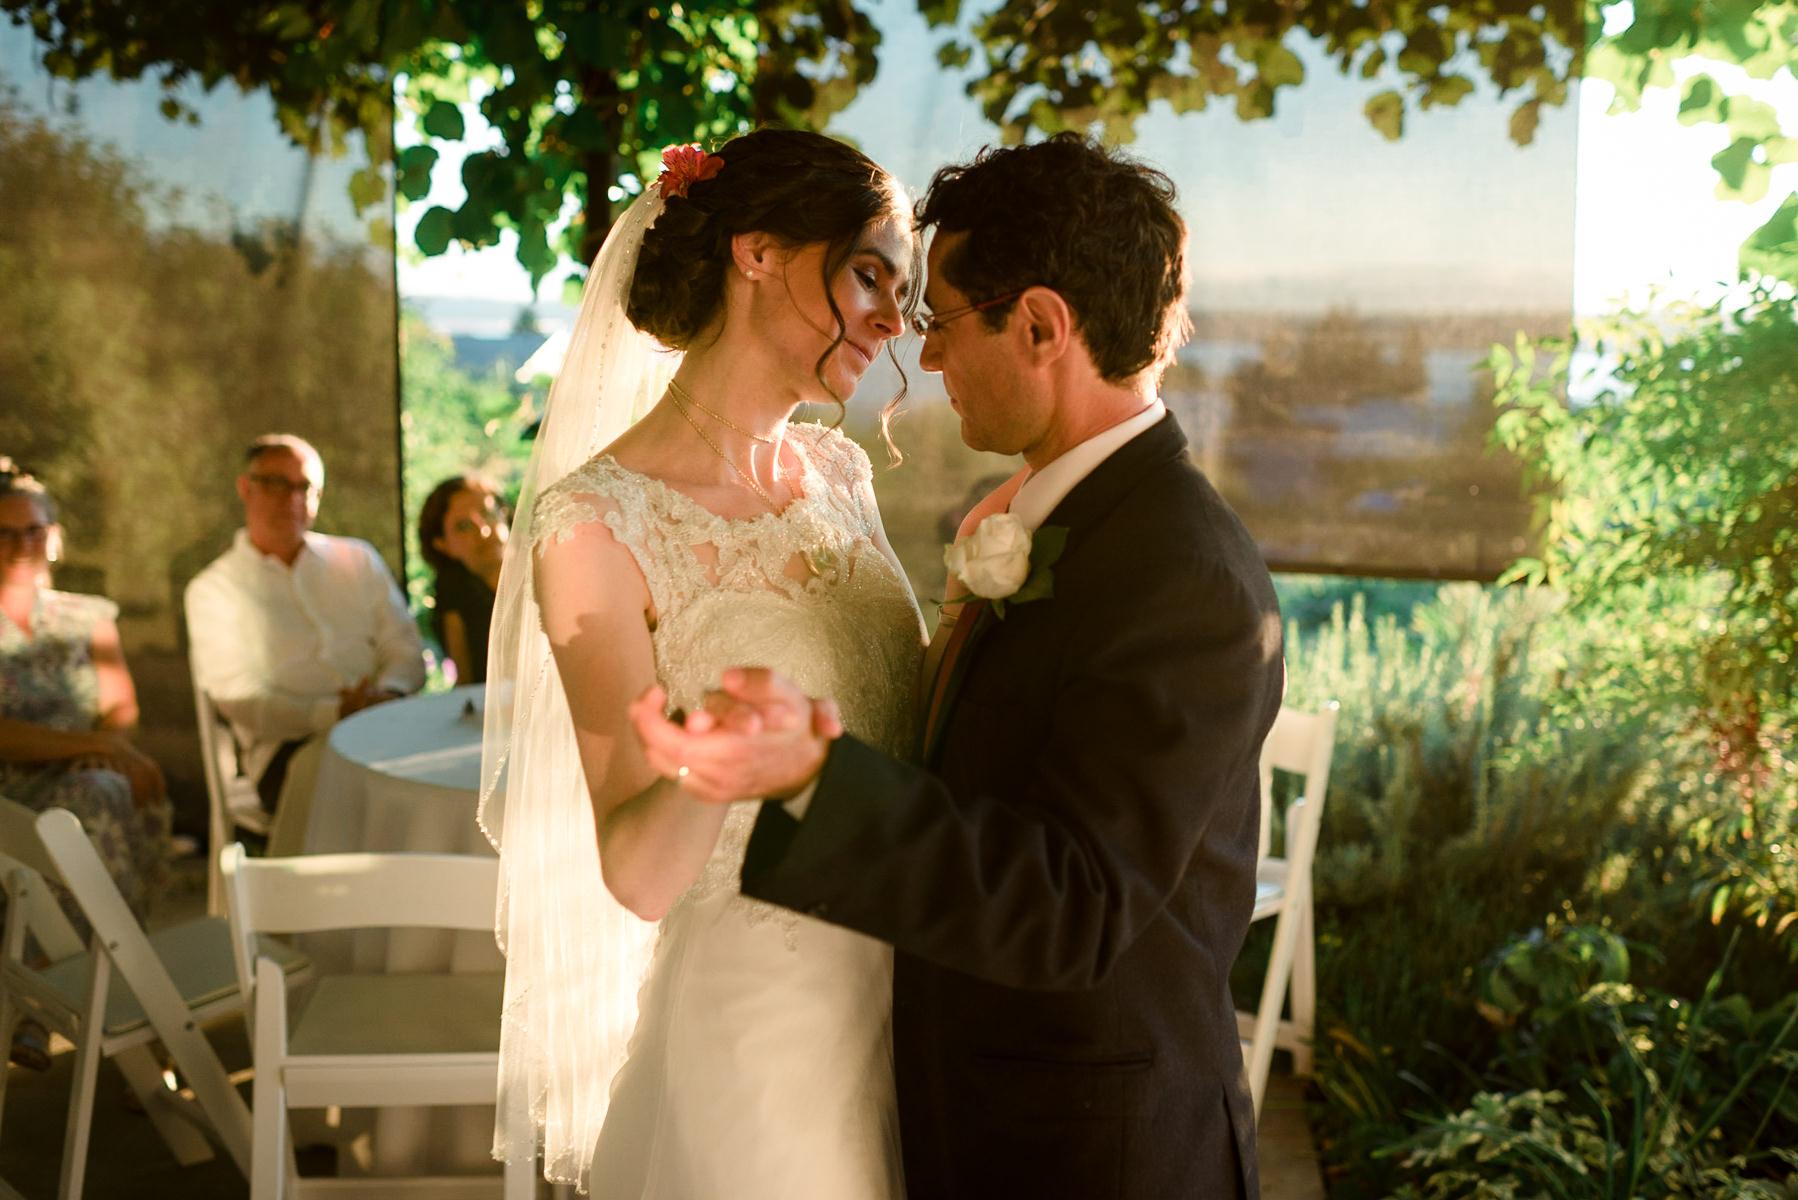 Andrew Tat - Documentary Wedding Photography - Kirkland, Washington - Emily & Cuauh - 43.JPG